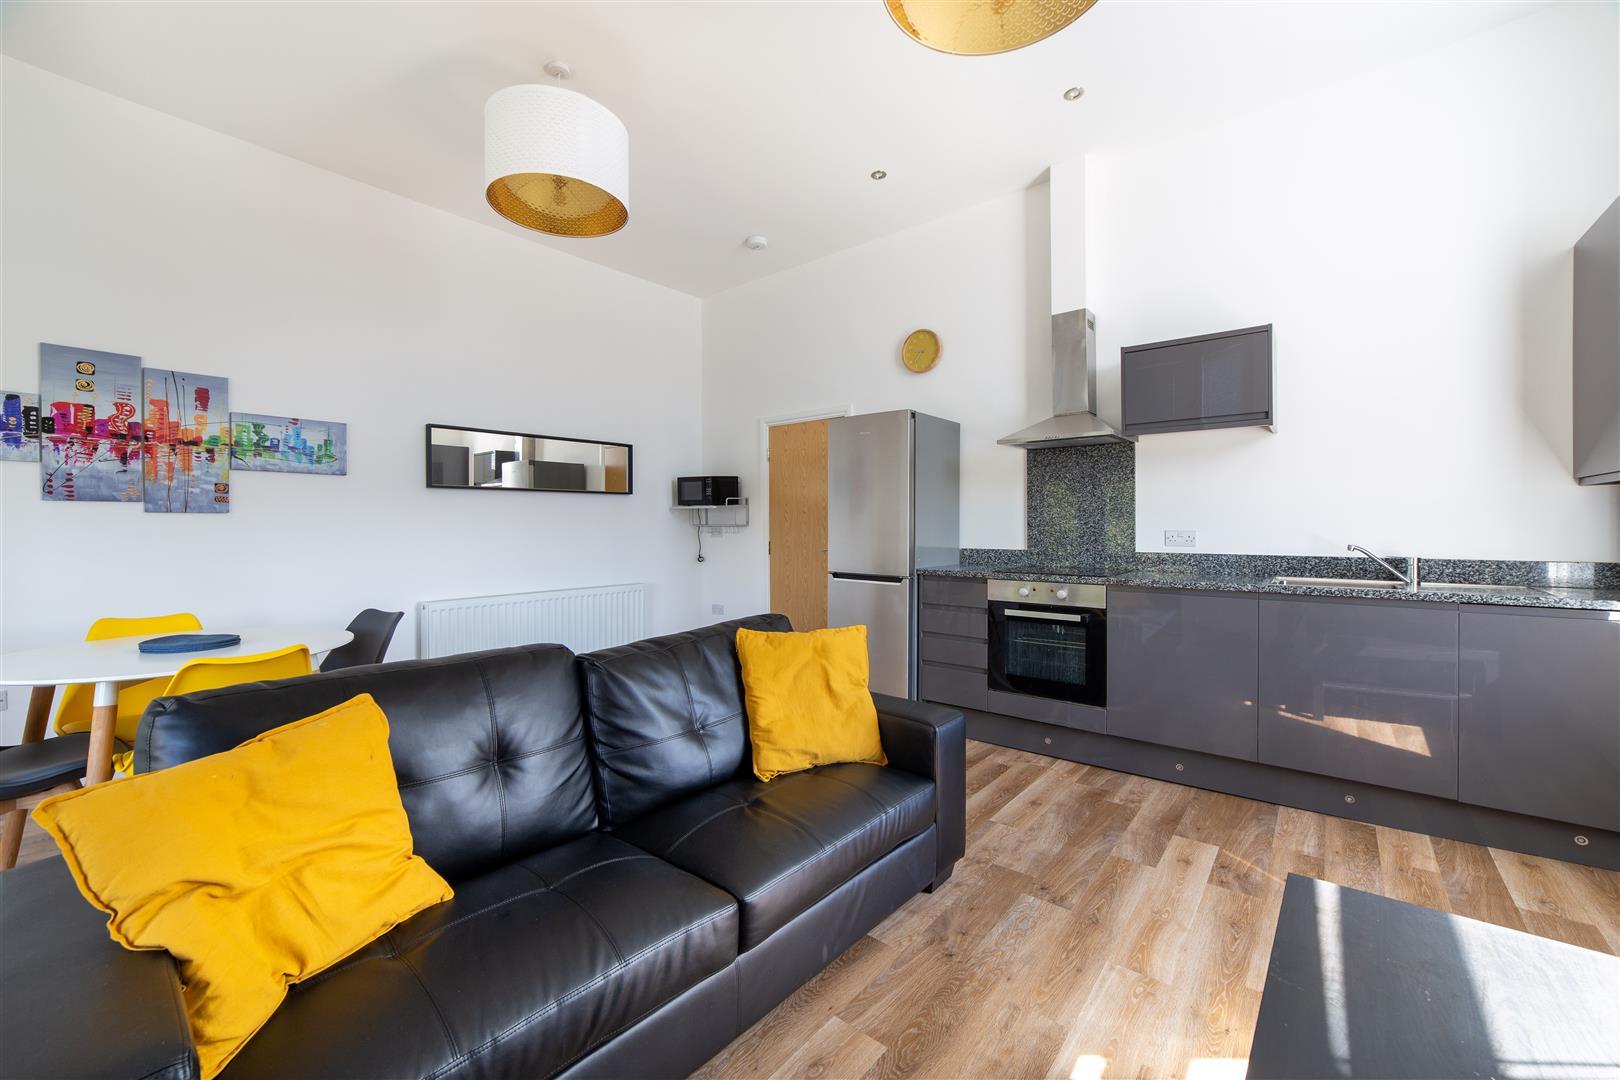 2 bed apartment to rent in Jesmond, NE2 1NE, NE2